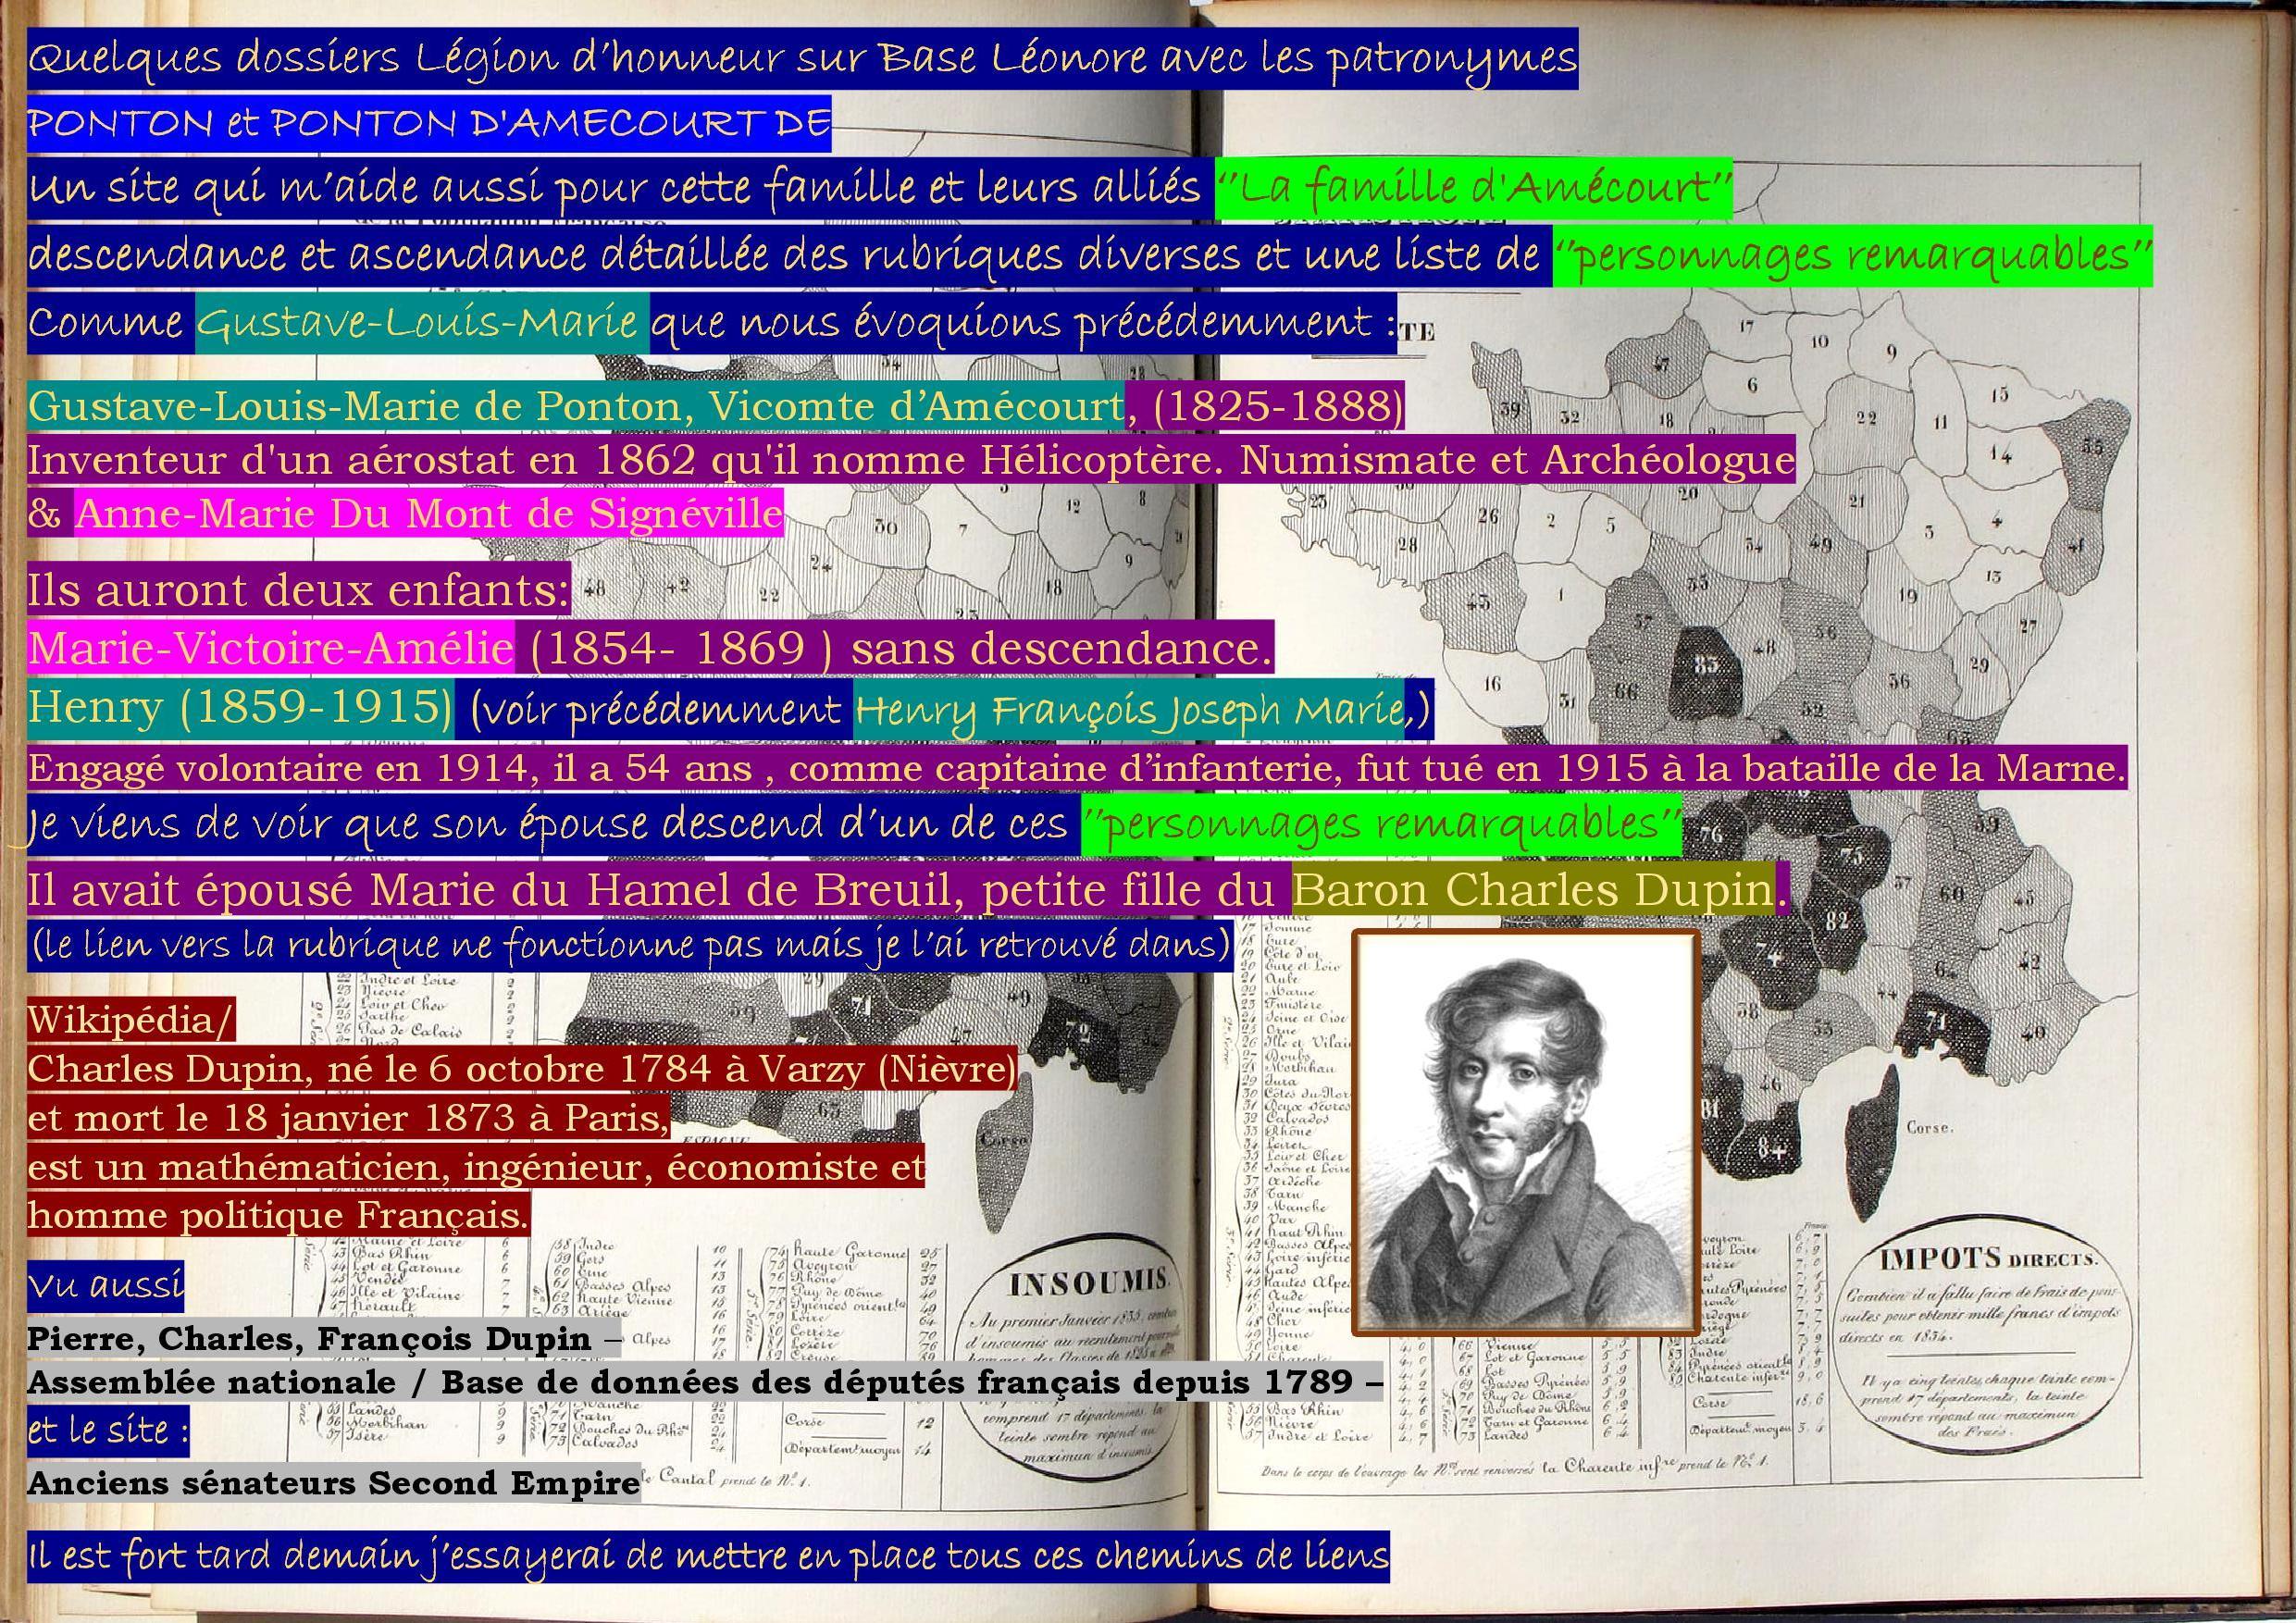 Presentation_de_mes_travaux_genealogiques_C_novembre_201924_024.jpg